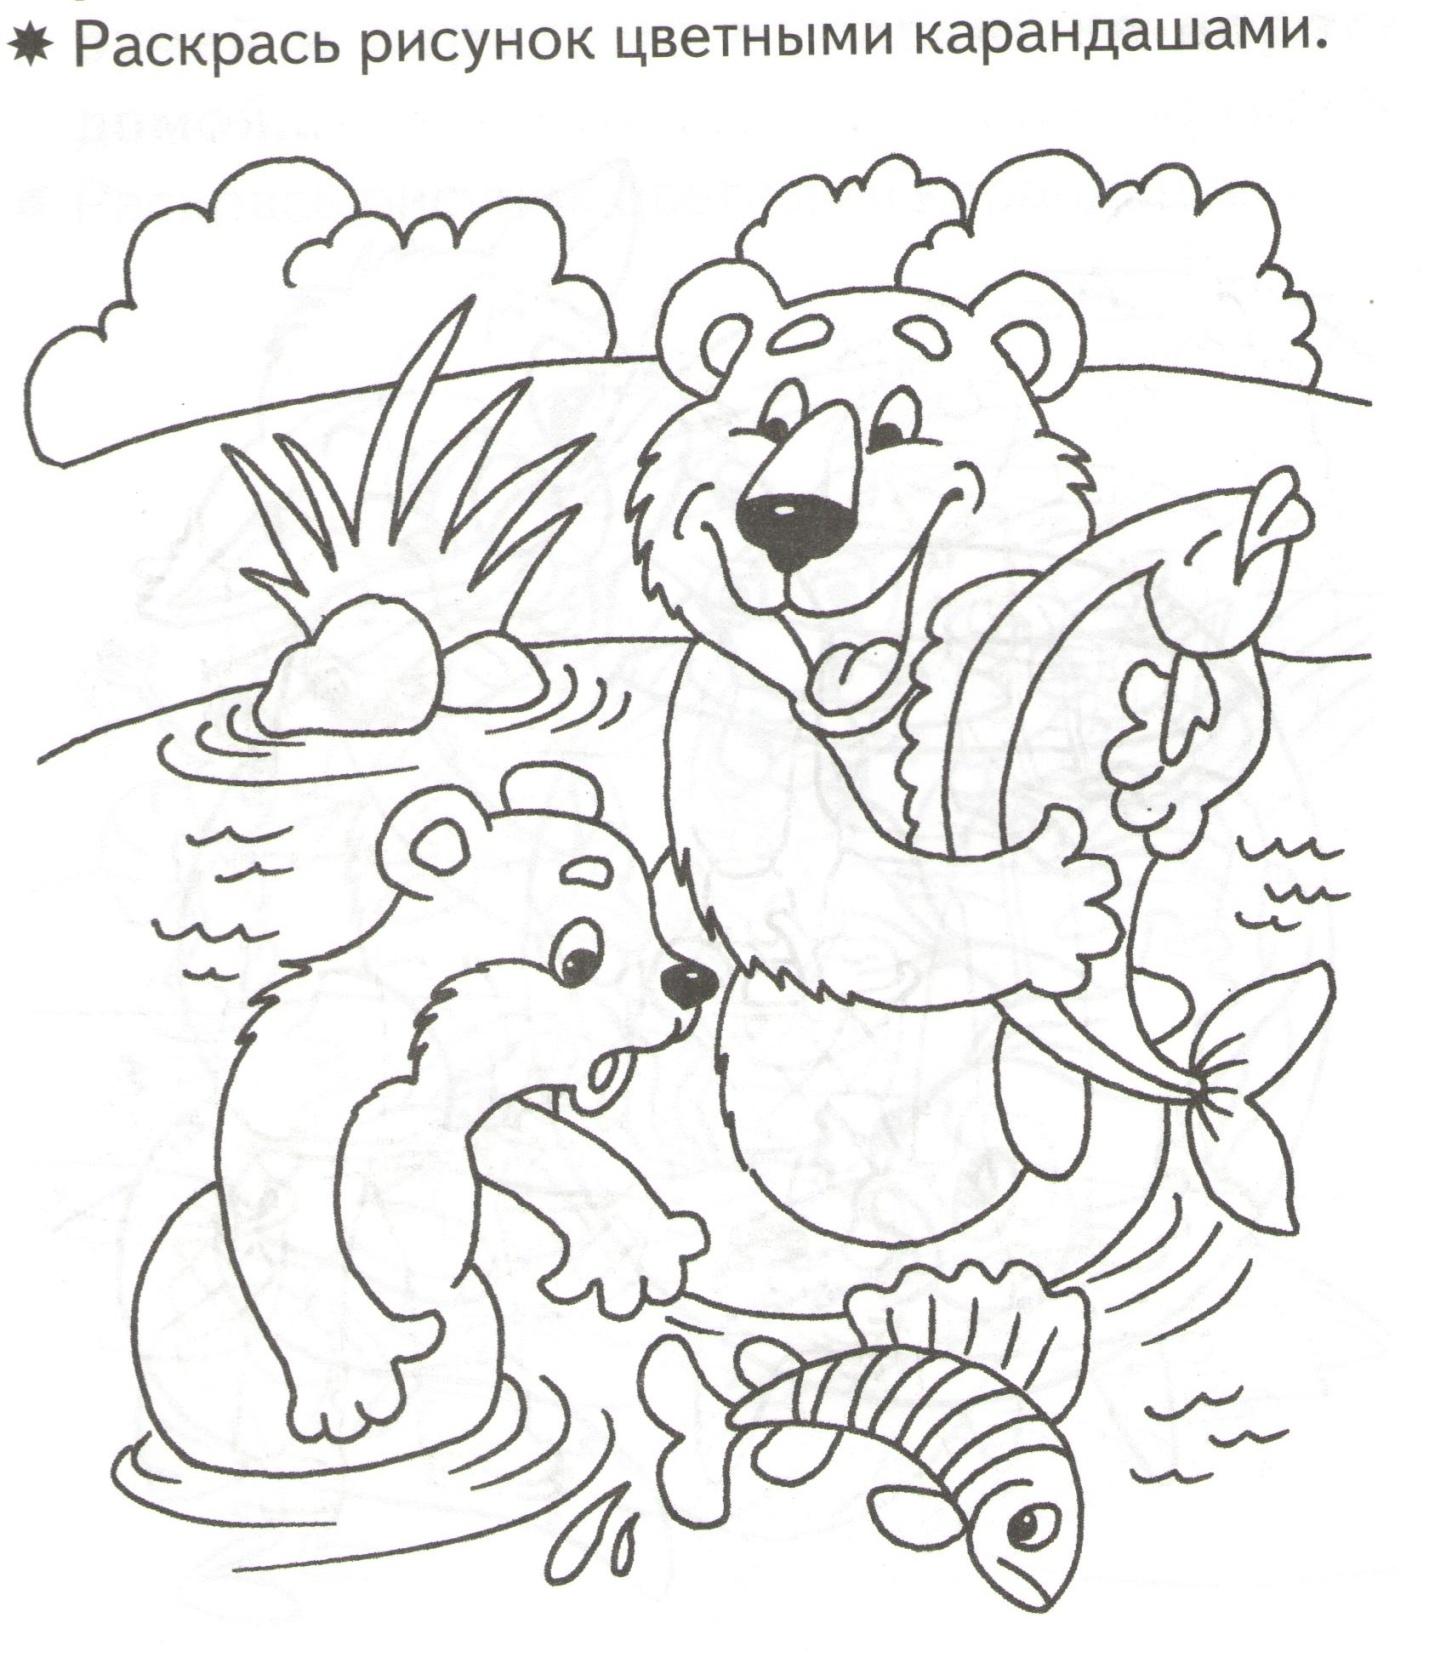 C:\Users\sisadmin\Pictures\приложения 2\2016-02-28 медвежонок\медвежонок 001.jpg